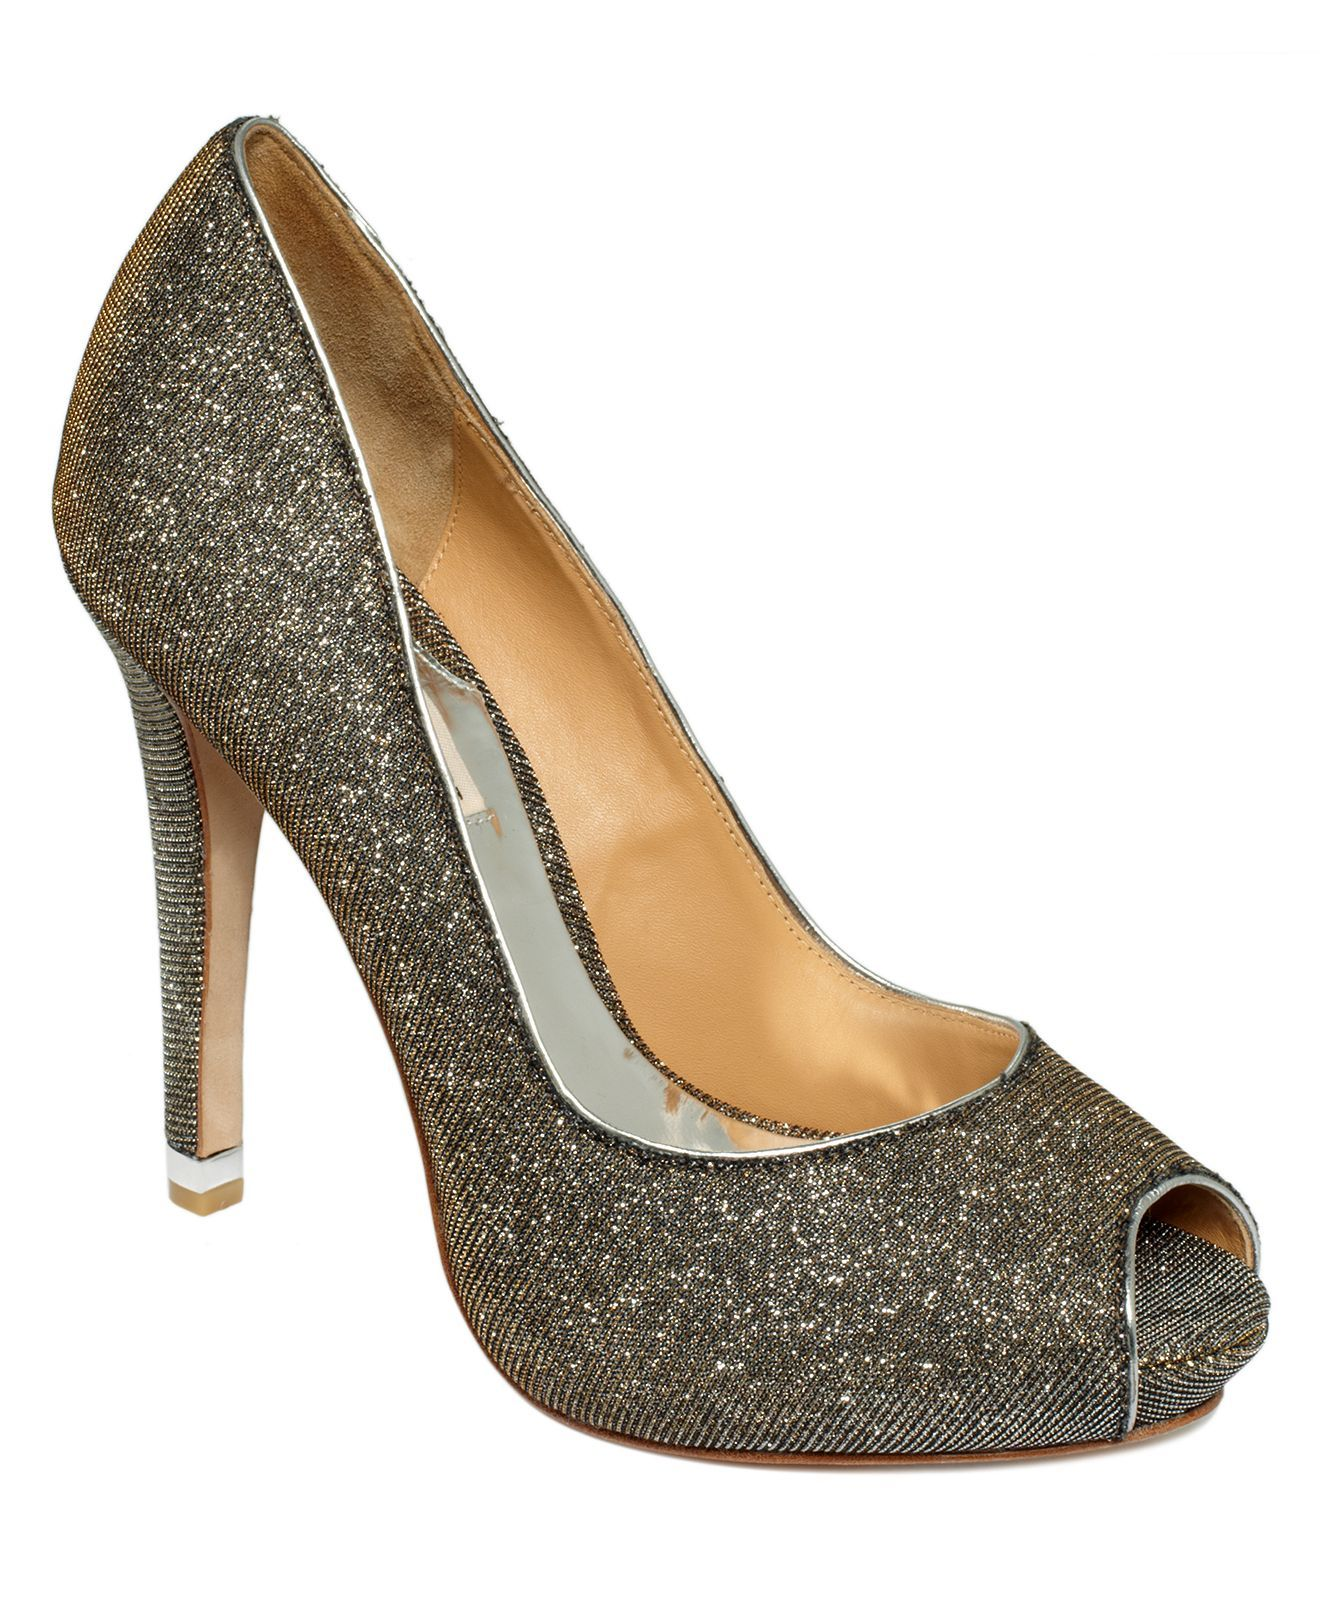 245 bucks   Badgley Mischka Shoes, Humbie IV Evening Pumps - Evening & Bridal - Shoes - Macy's